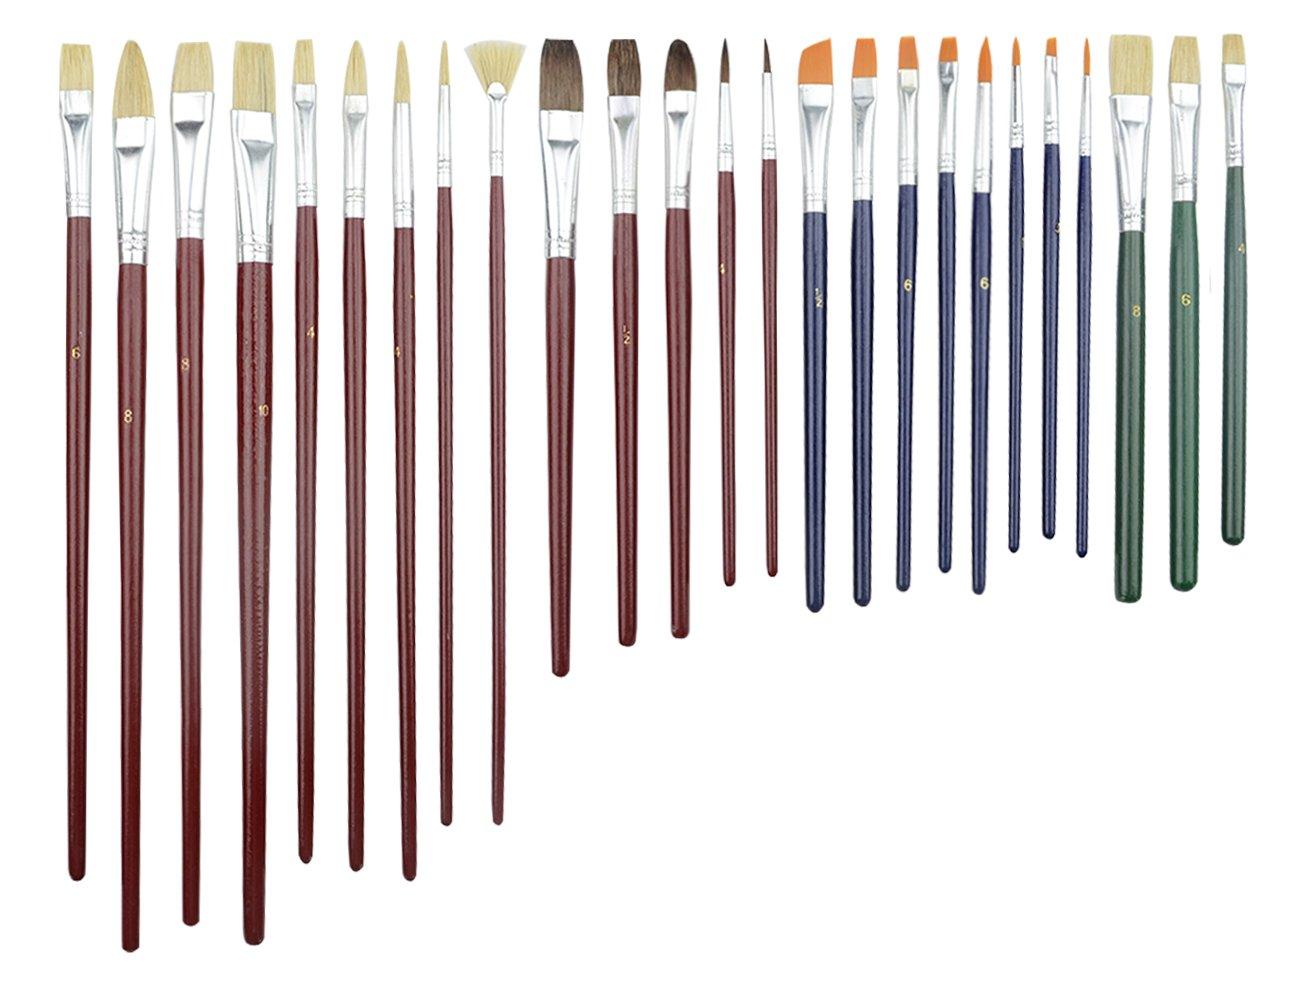 TOVOT 25 PCS Paint Brush Set Paint Artist Brush Set Artist Detail Paint Brush Set-Miniature Liners Brushes for Fine Detailing,Model Painting,Airplane Kits,Craft Decorations,Oil Painting